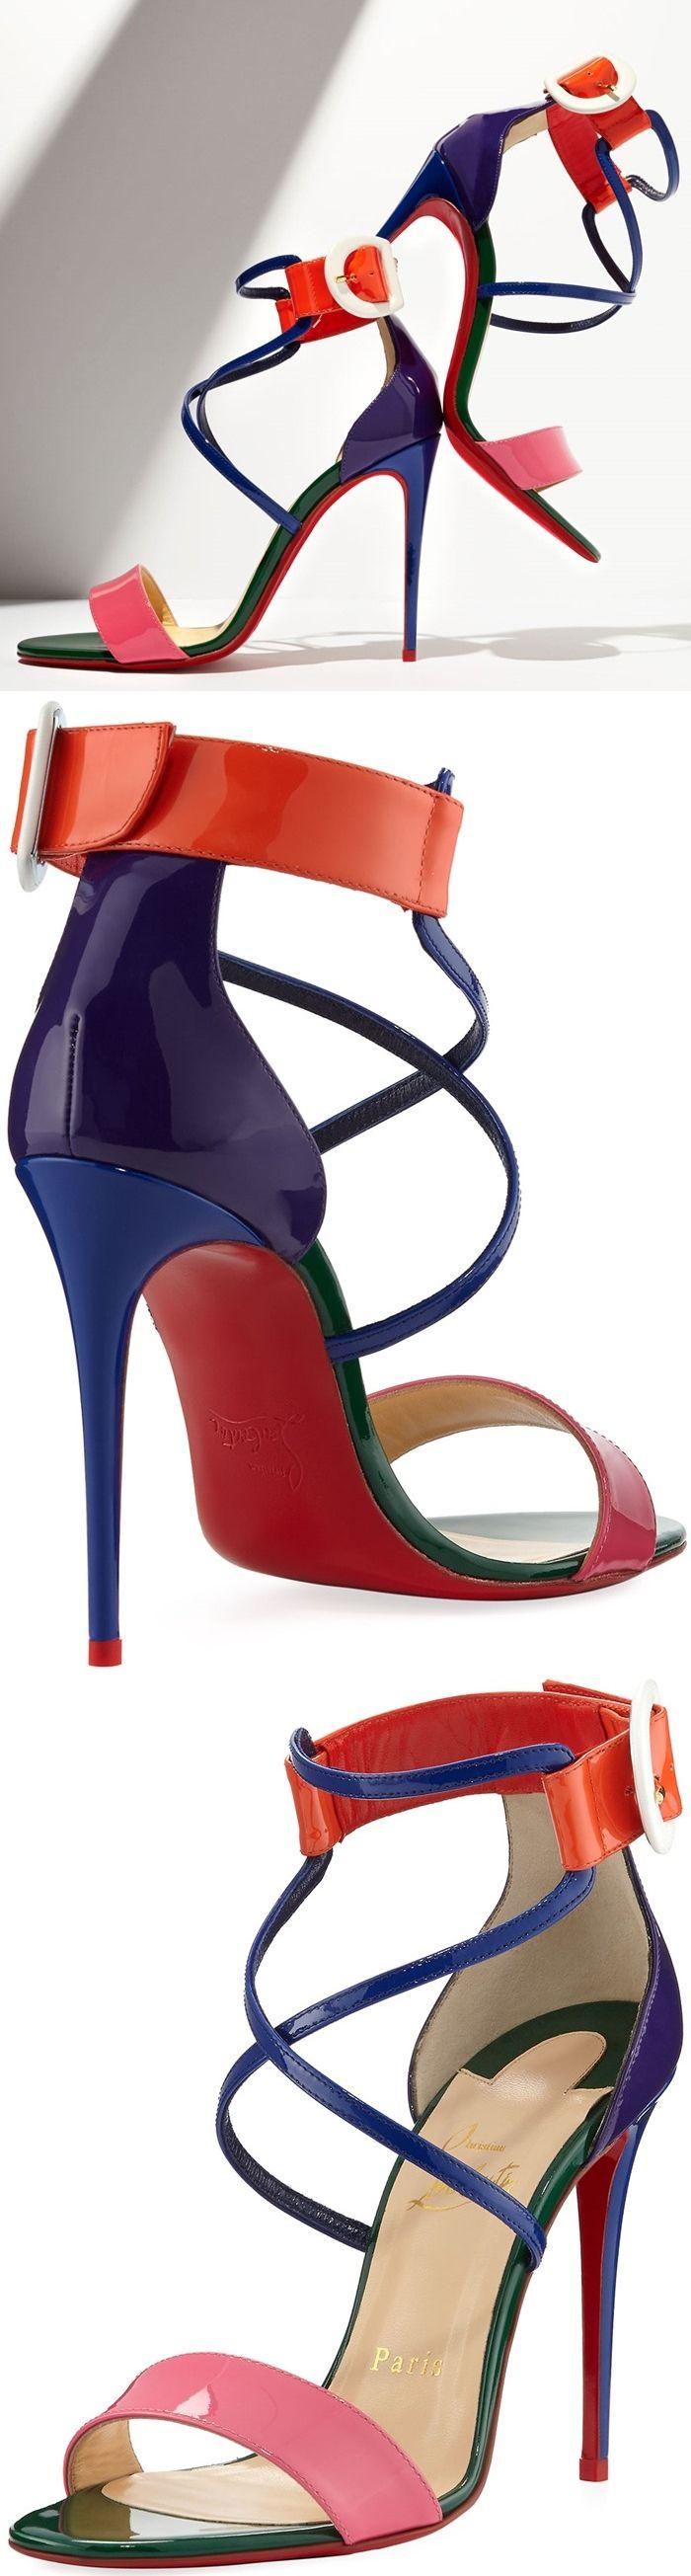 Christian Louboutin 'Choca' Colorblock Red Sole Sandals www.ScarlettAvery.com